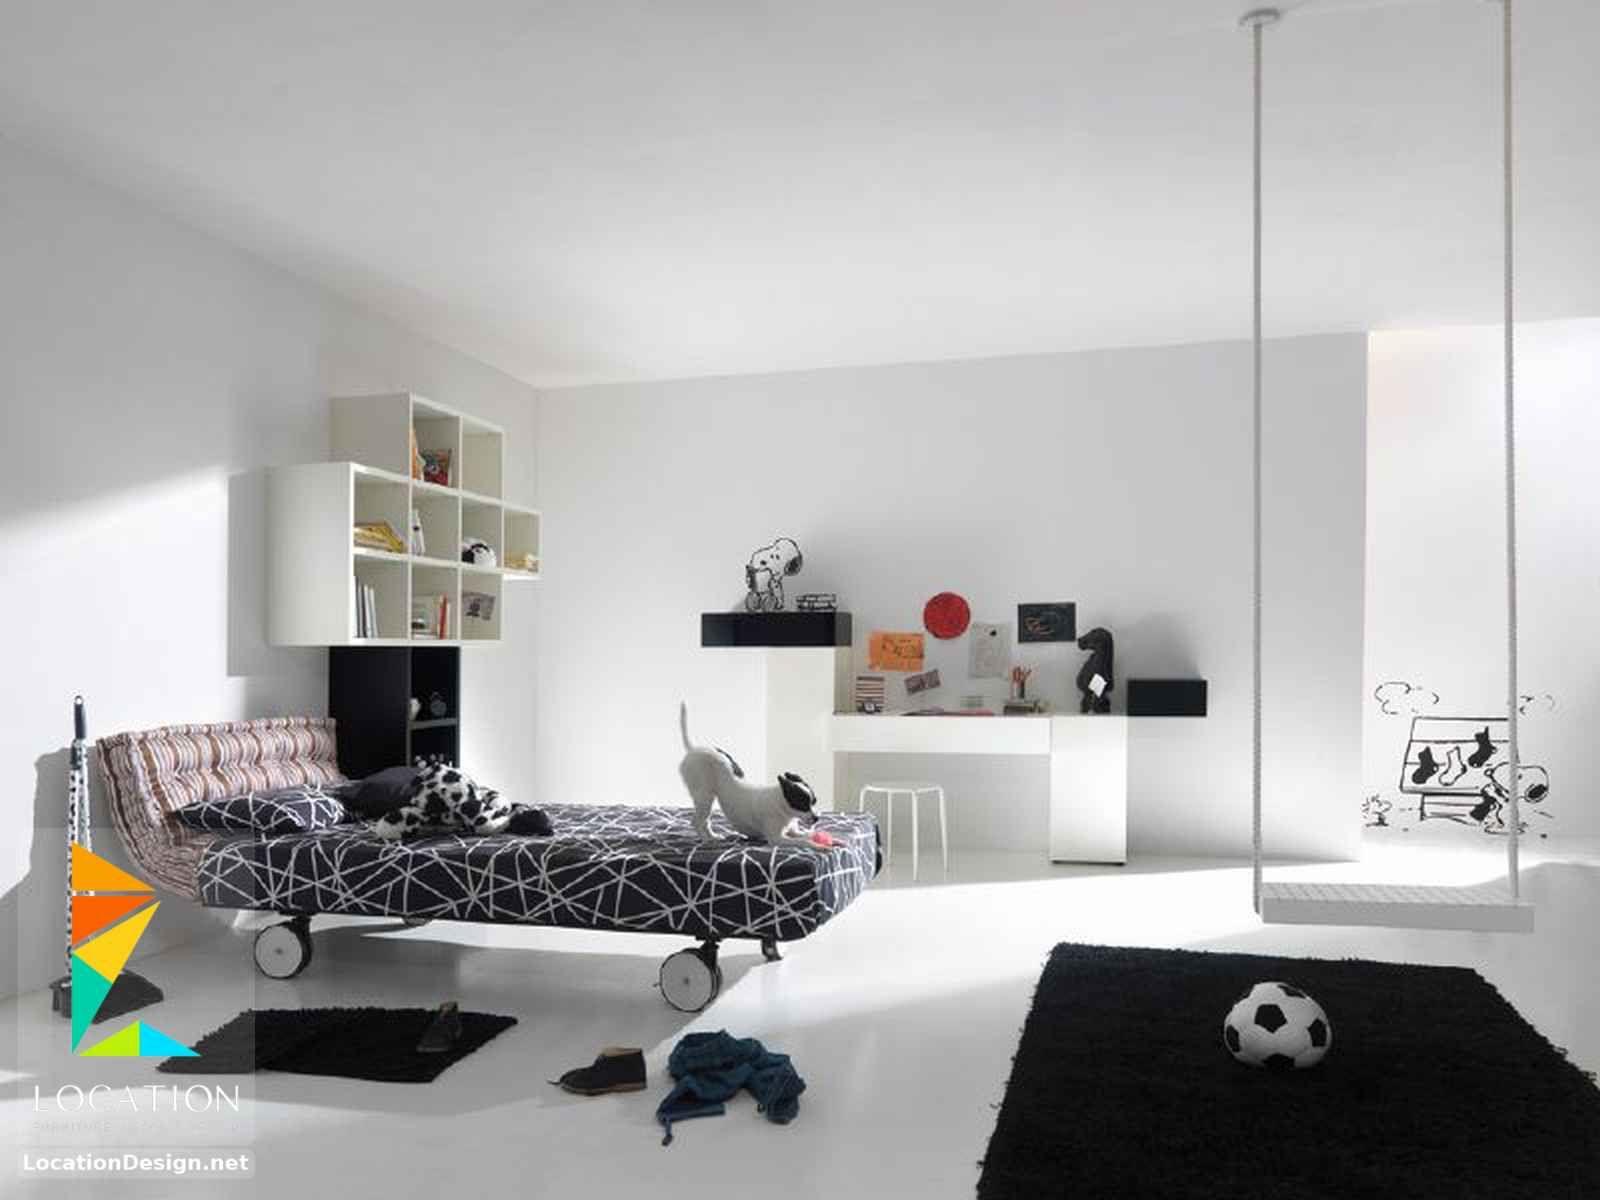 غرف نوم اولاد شباب أحدث موديلات غرف شبابي مودرن لوكشين ديزين نت Modern Kids Room Modern Kids Bedroom White Kids Room